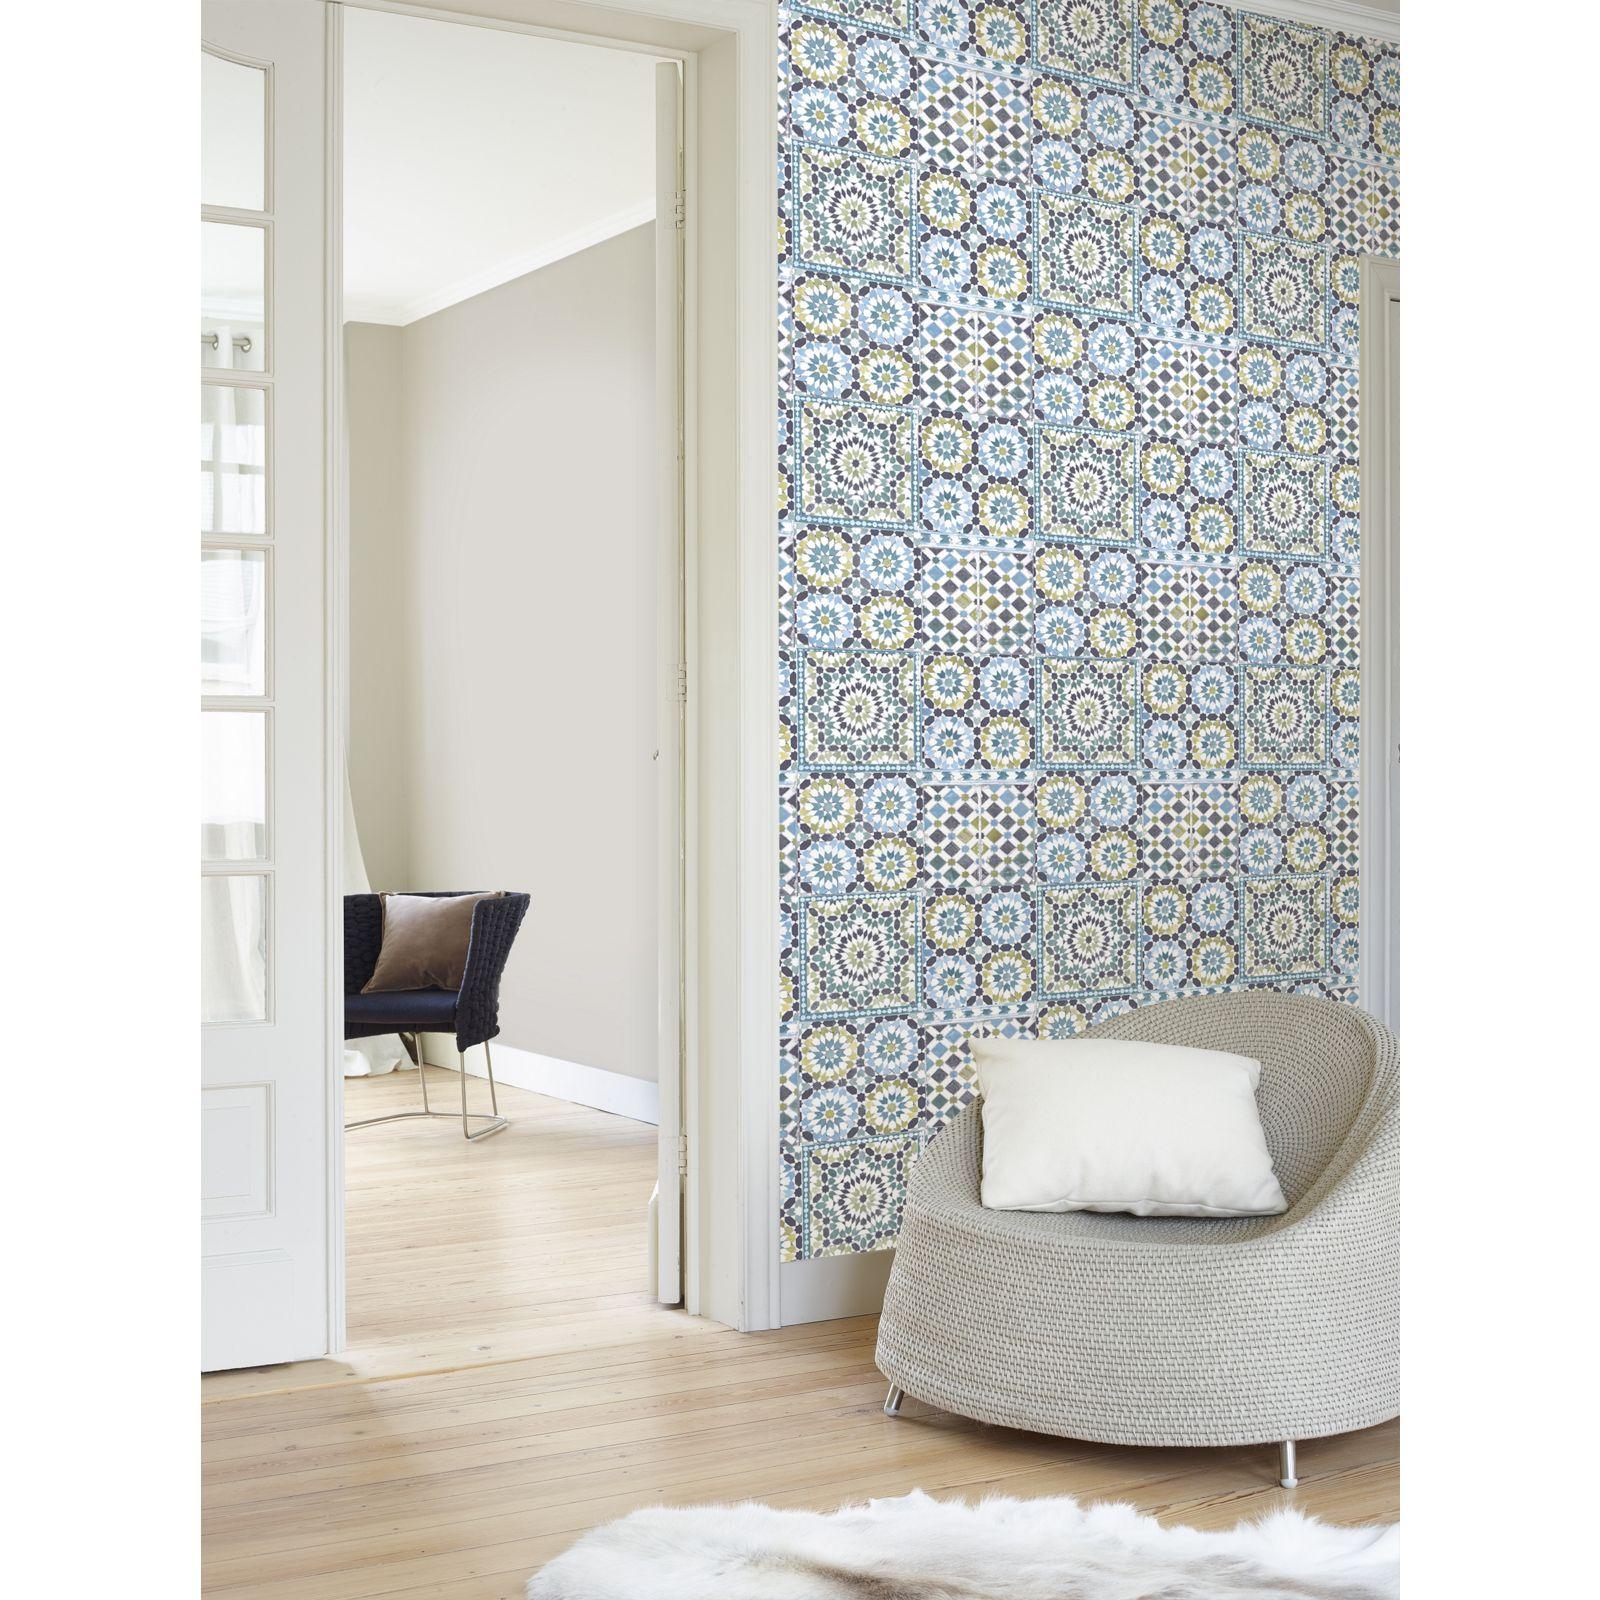 Grandeco Moroccan Tile Wallpaper Tile wallpaper, Home